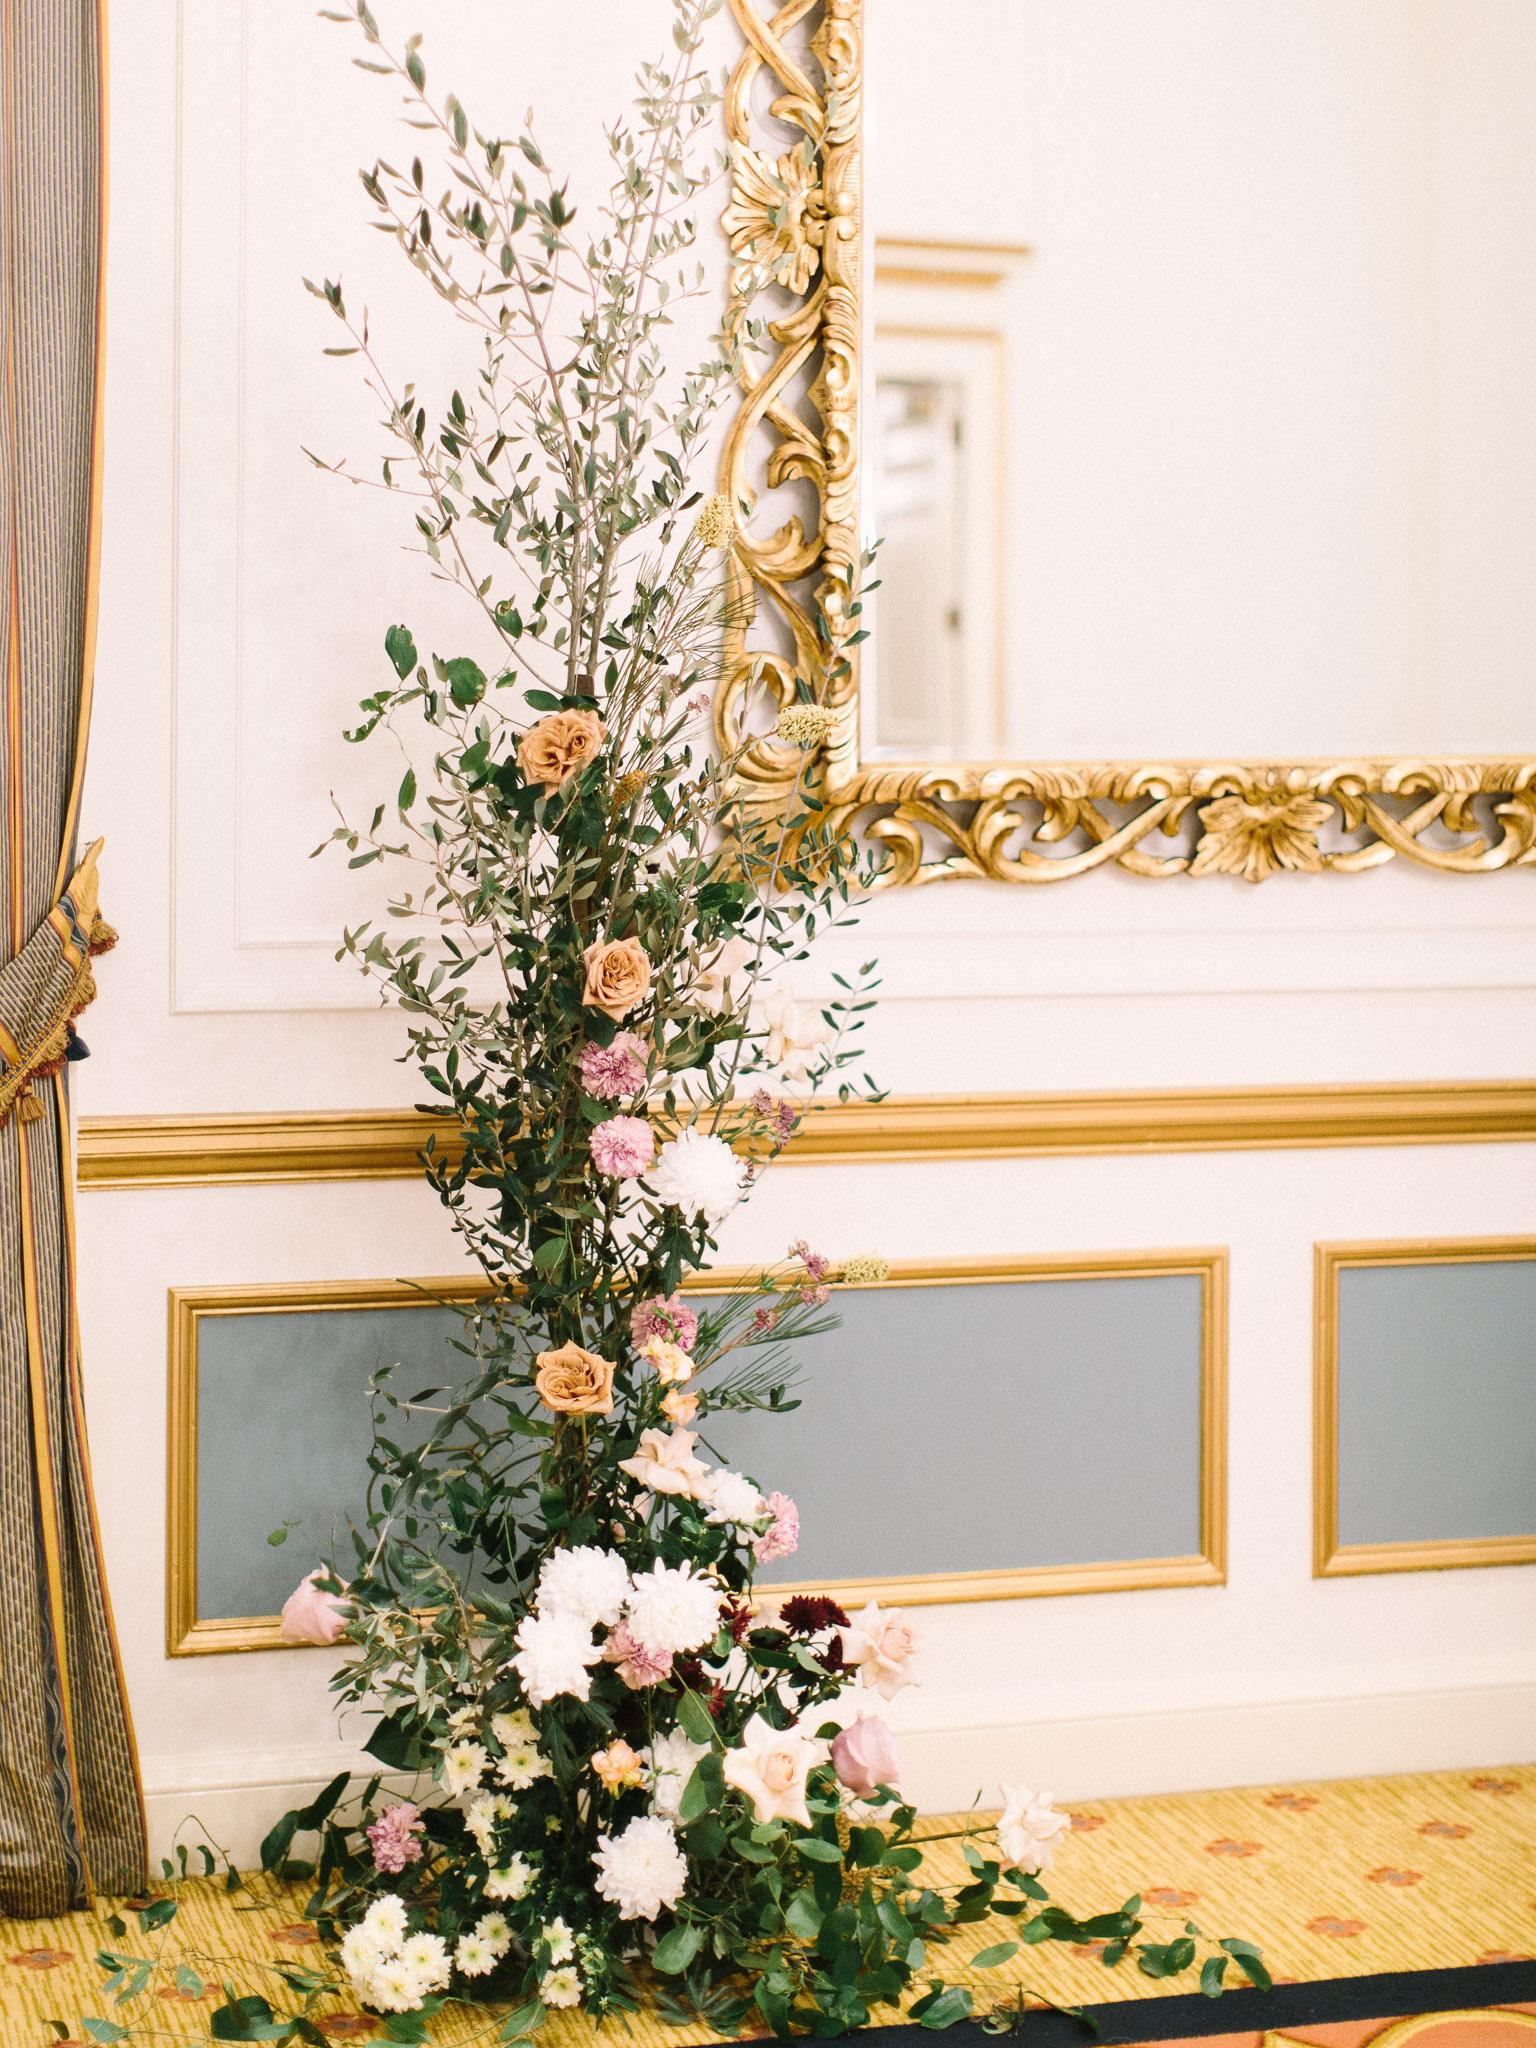 Hanna&Jordan Wedding_HotelVancouver_9114.jpg